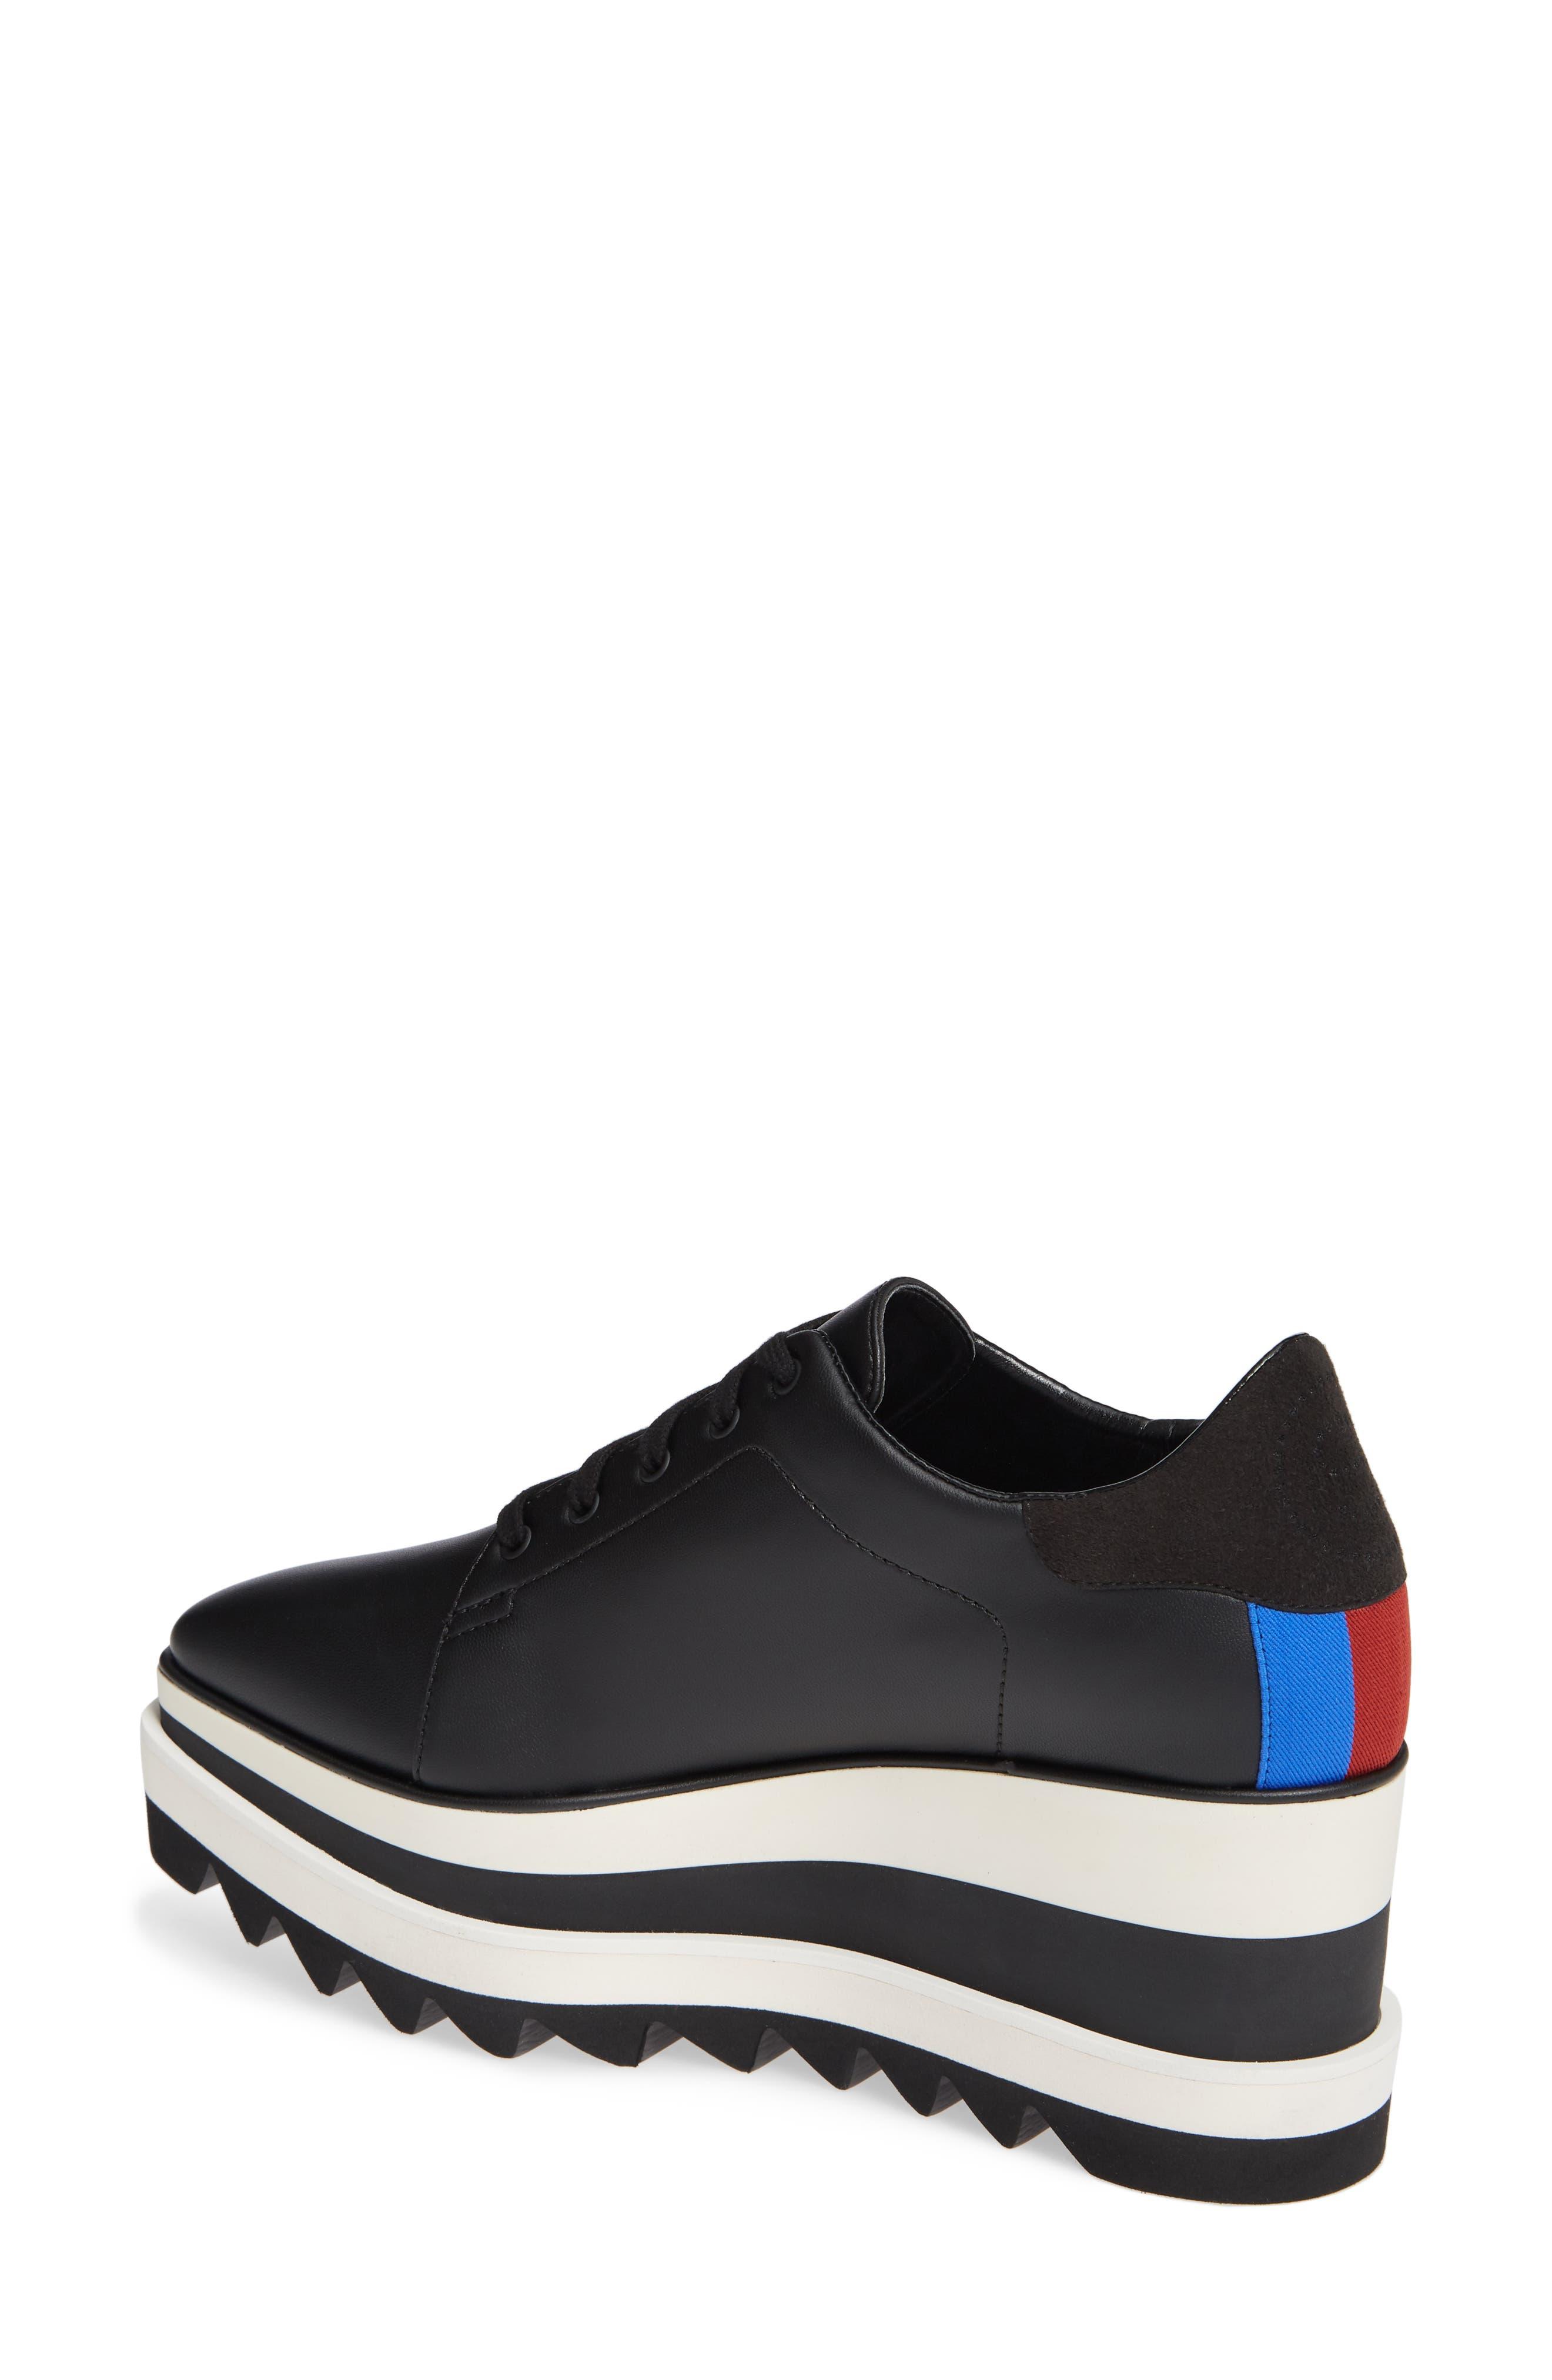 Sneak-Elyse Flatform Sneaker,                             Alternate thumbnail 2, color,                             BLACK